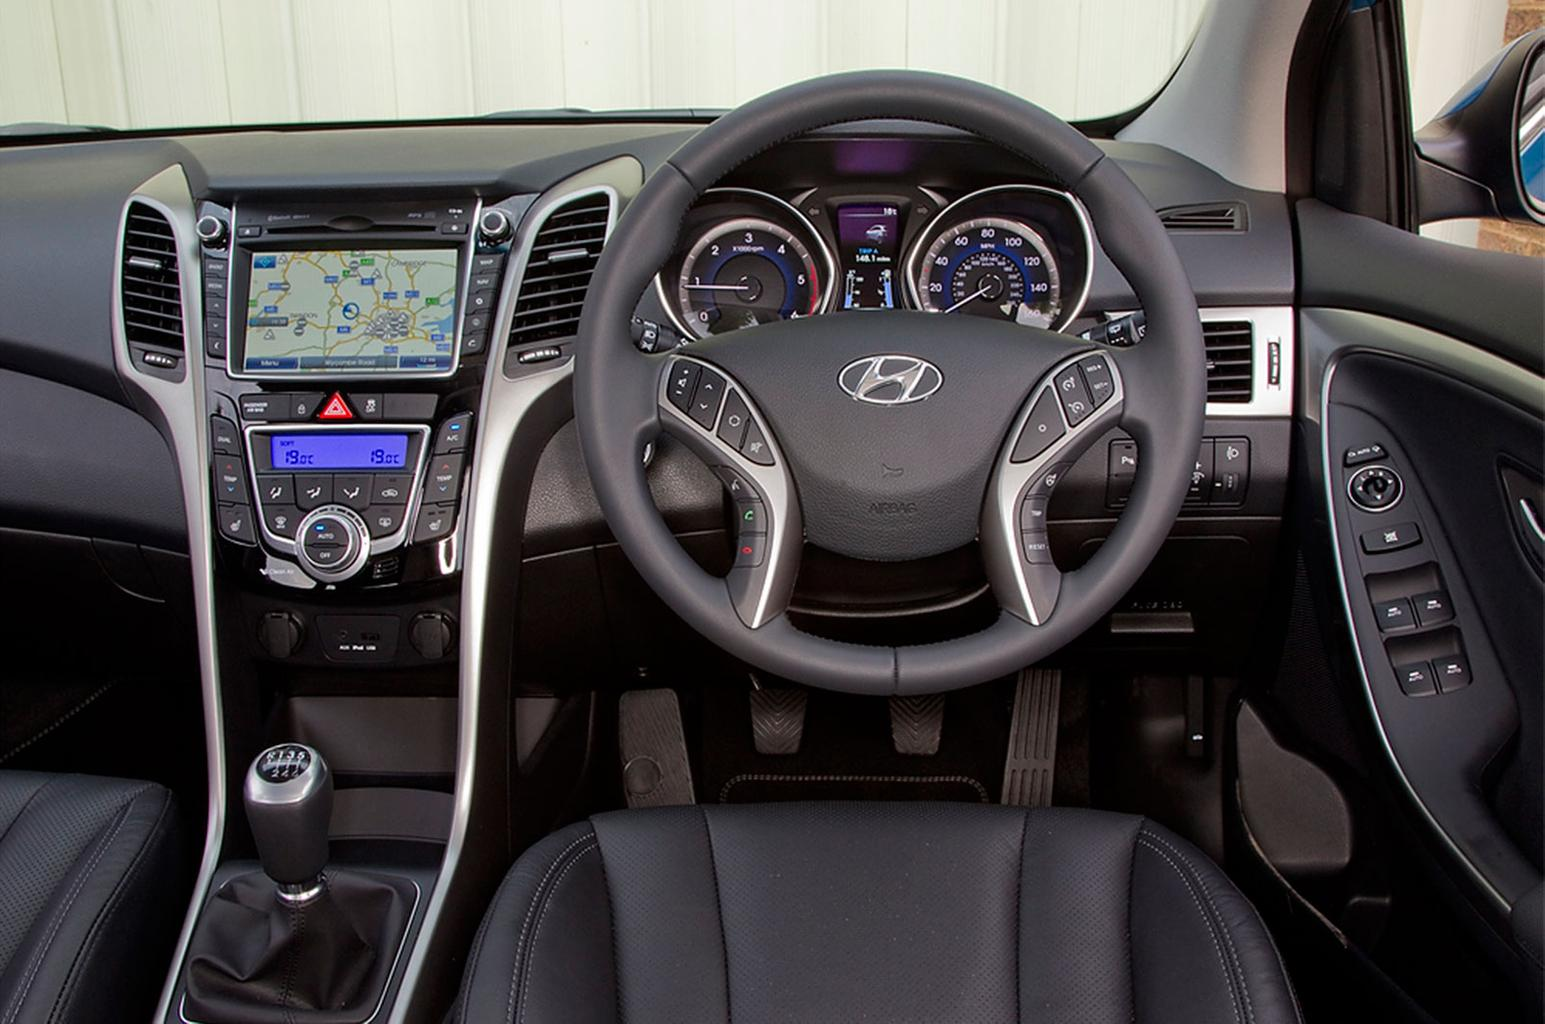 Used car of the week: Hyundai i30